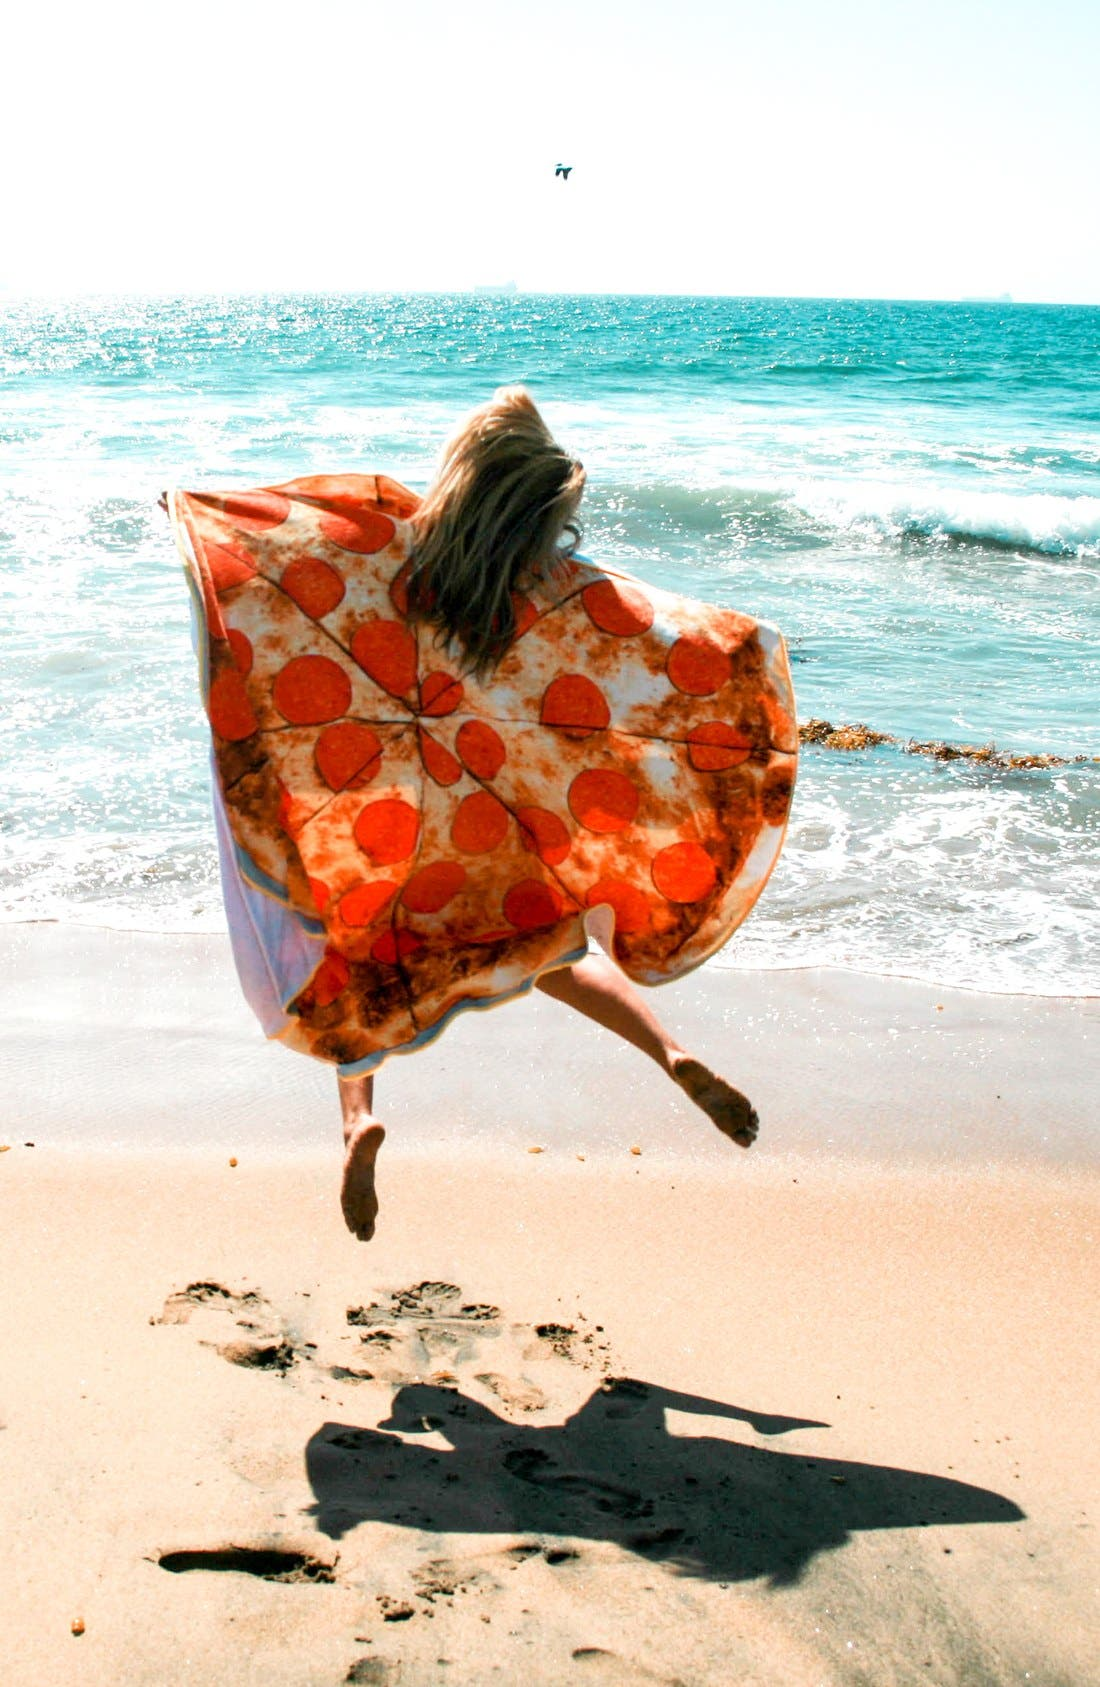 Alternate Image 3  - Round Towel Co. Pizza Round Beach Towel